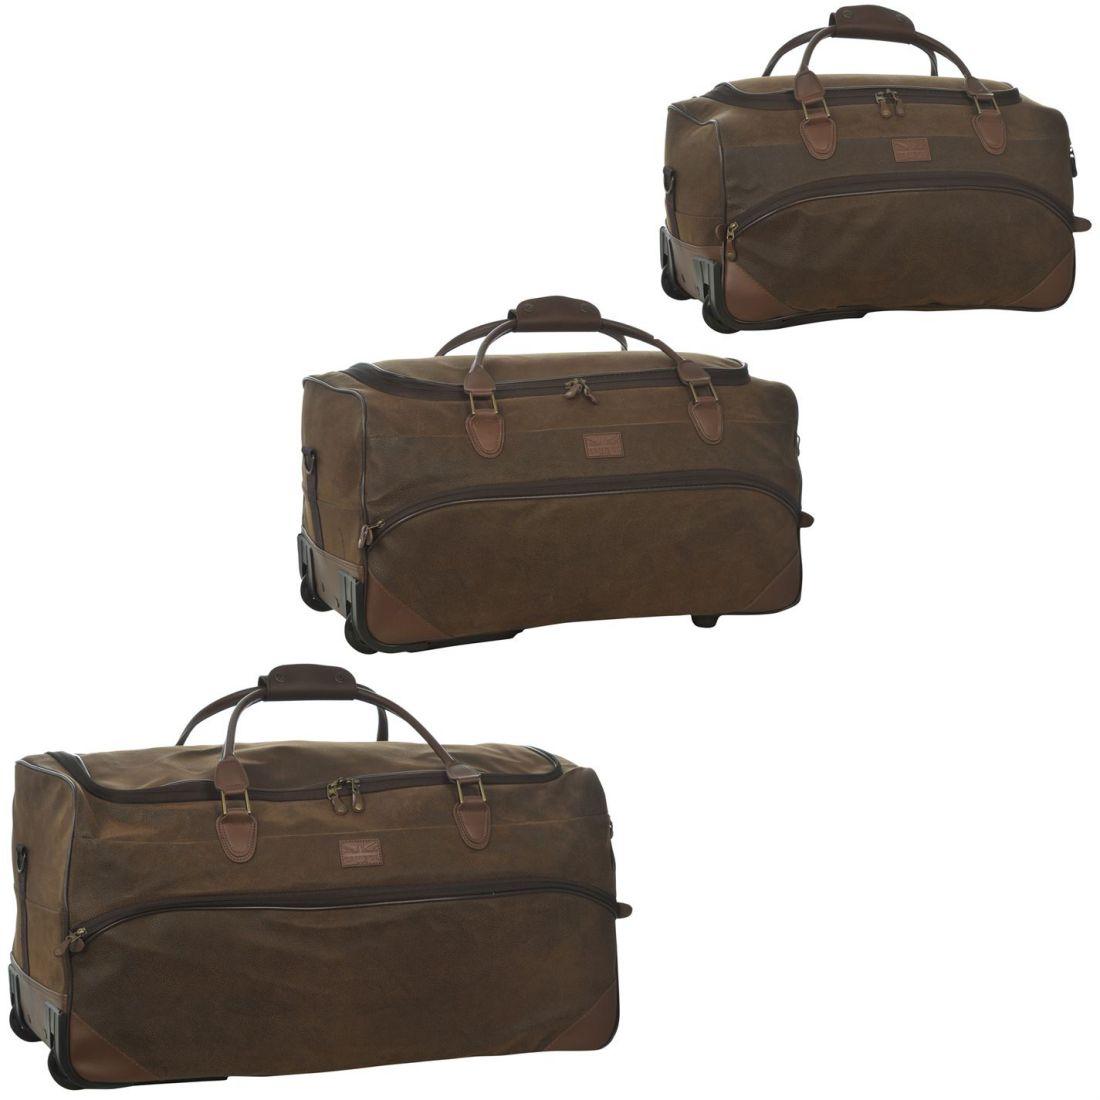 17a35b0c5e Kangol Choc Wheel Set 00 Travel Bag Luggage Wheeled. Kangol Chocolate Wheelie  Holdall Set